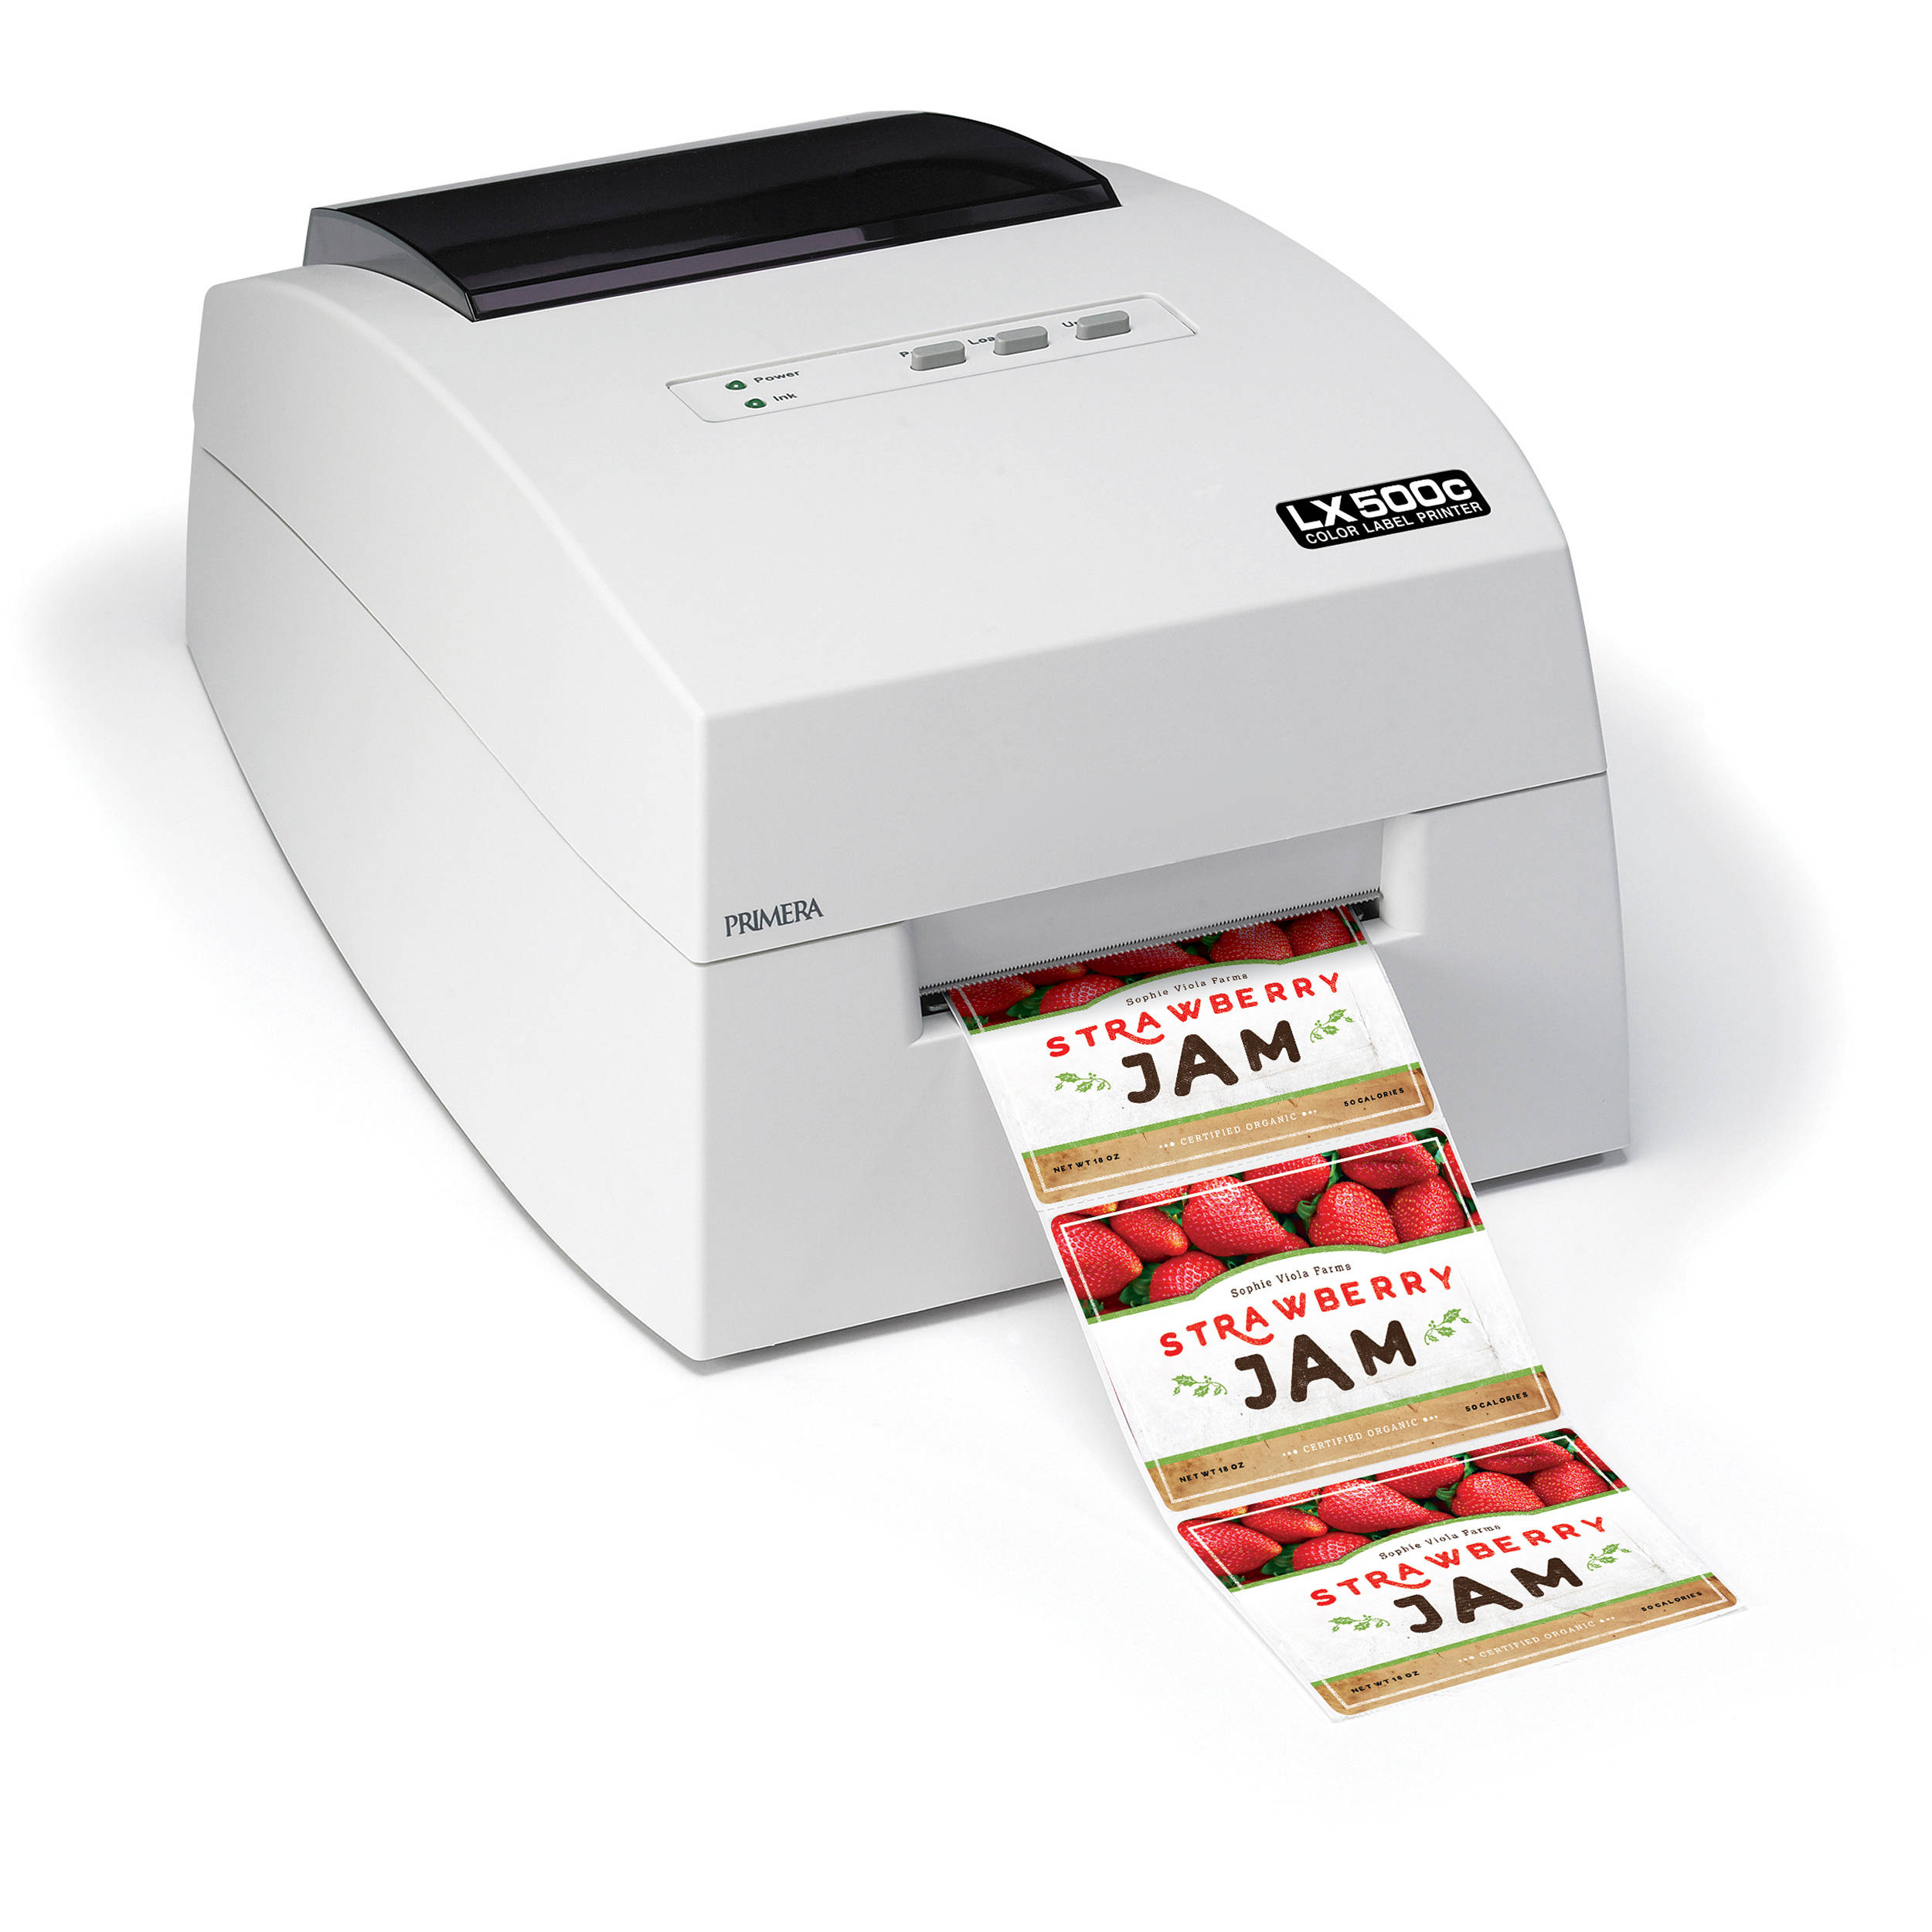 Primera Lx Color Label Printer Labels